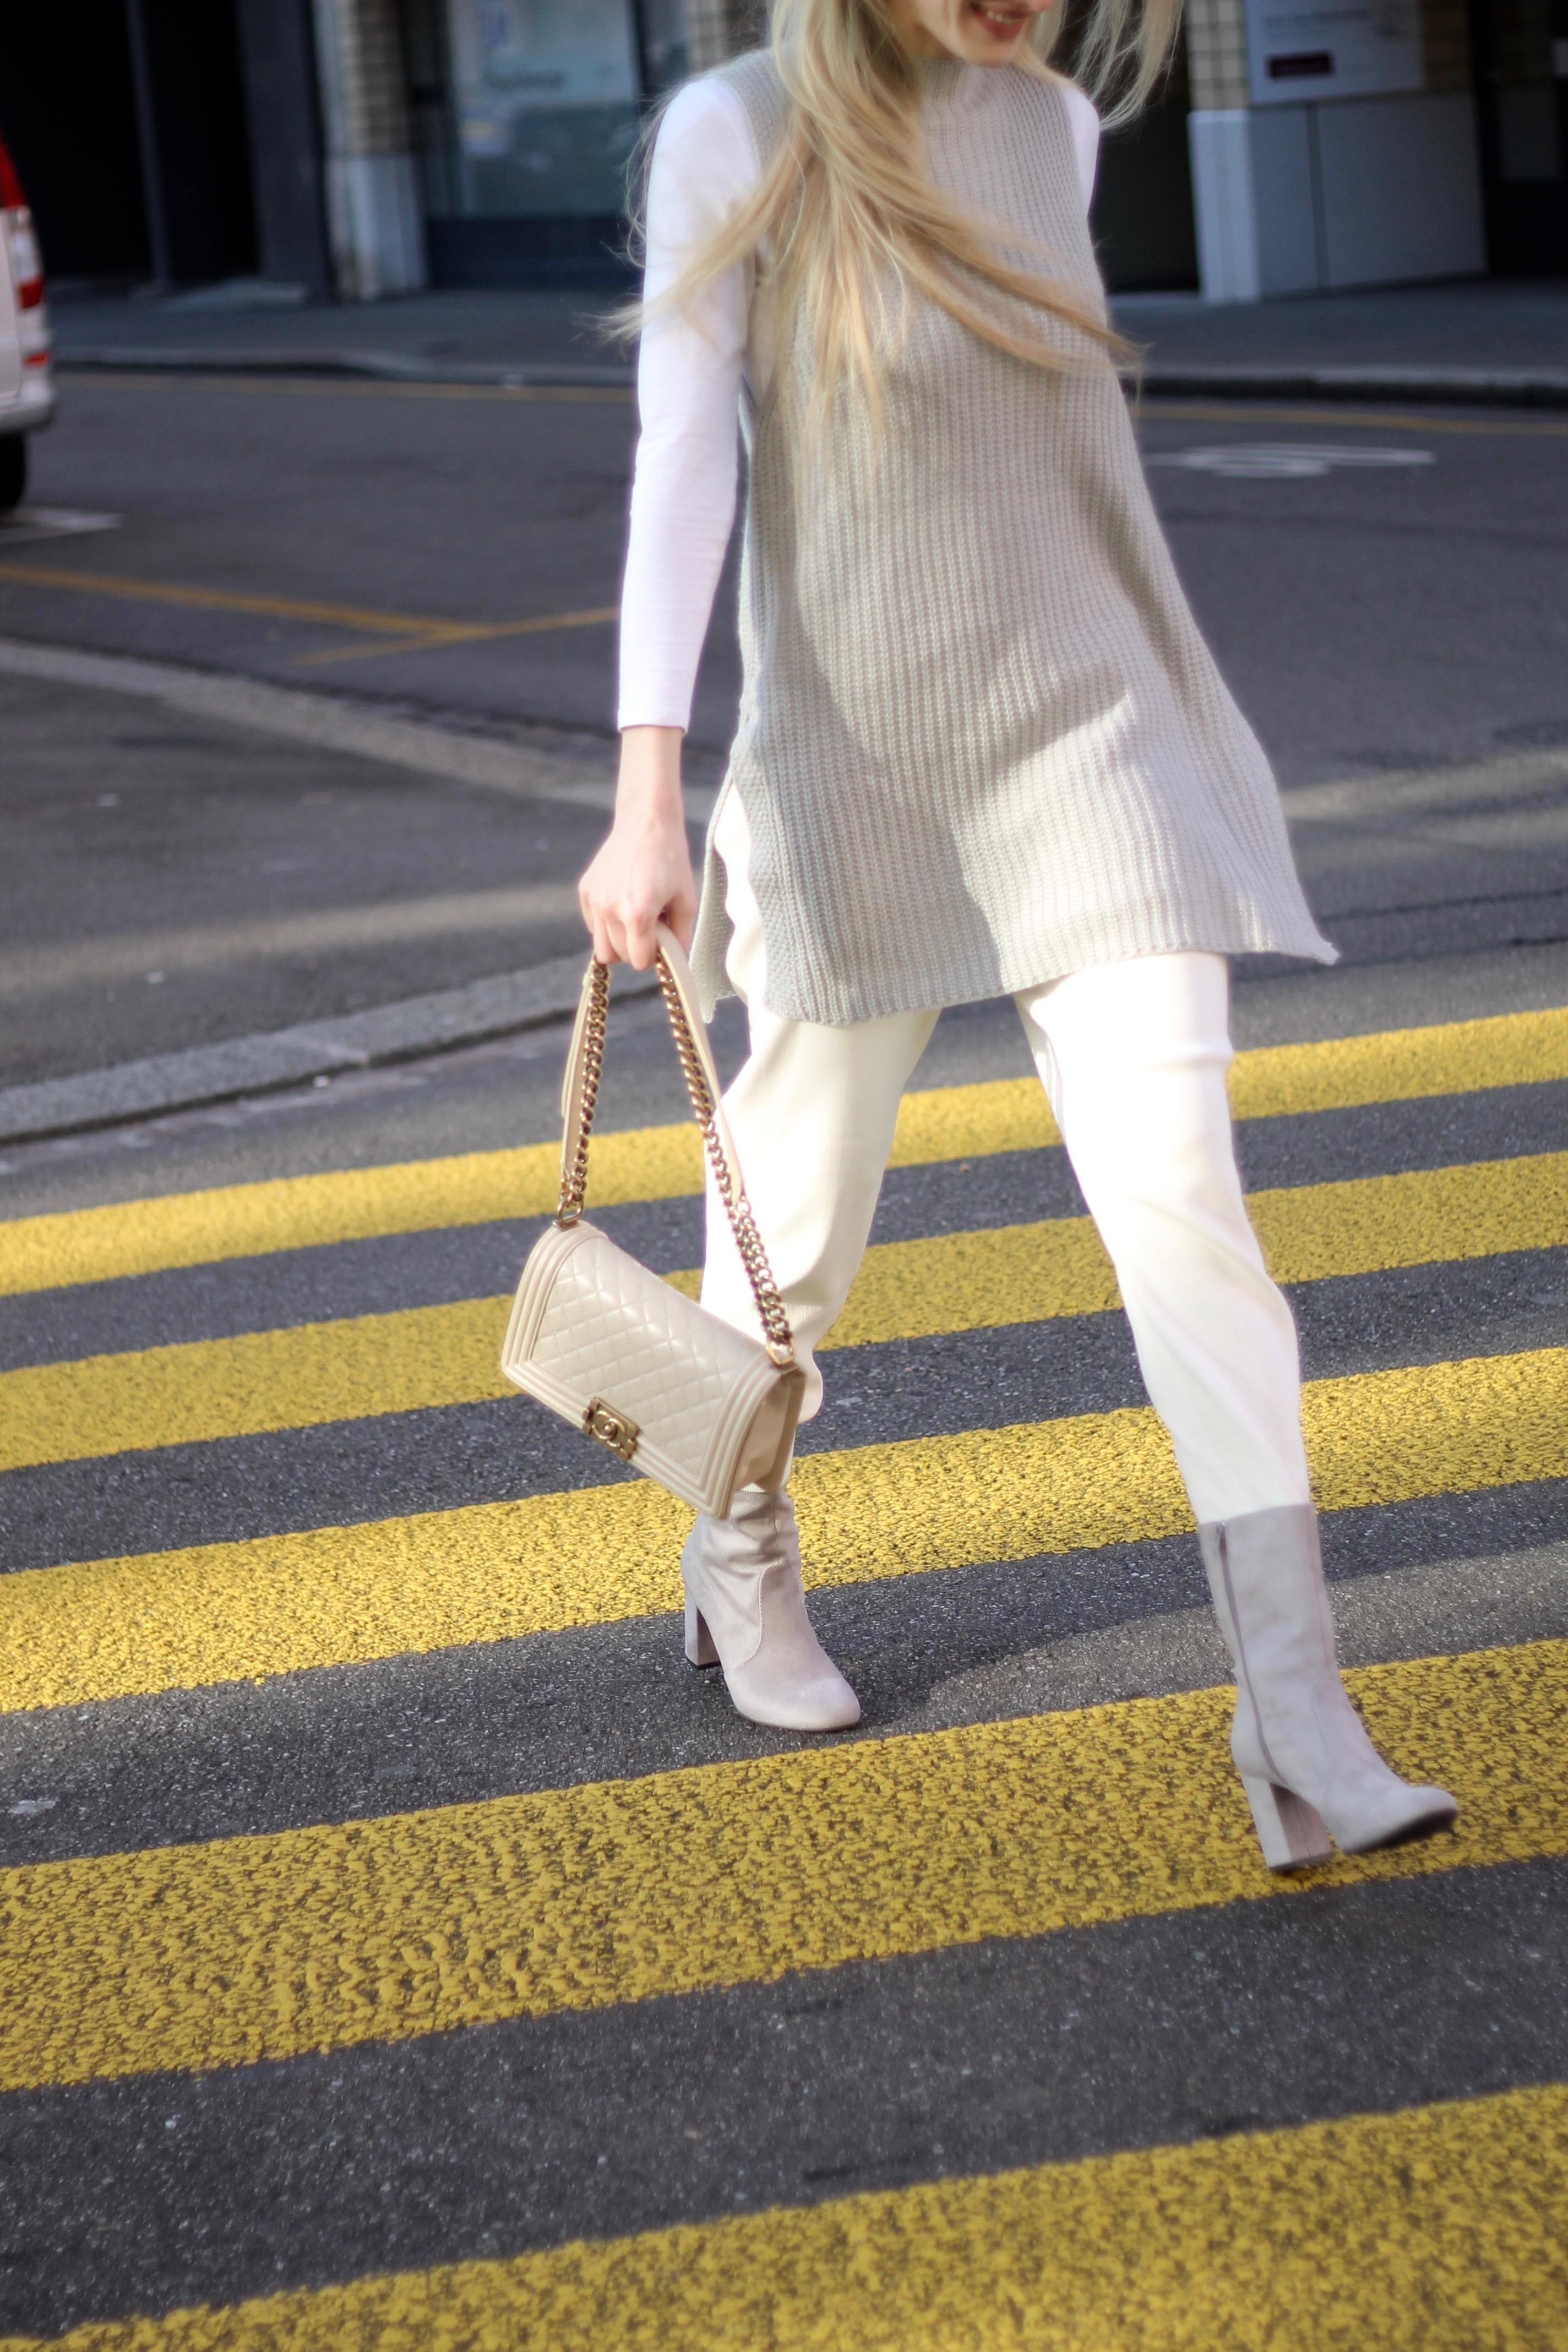 MON MODE | Fashion Blogger | Berlin Street Style | Fashion Trends | Basel| Travel | Switzerland